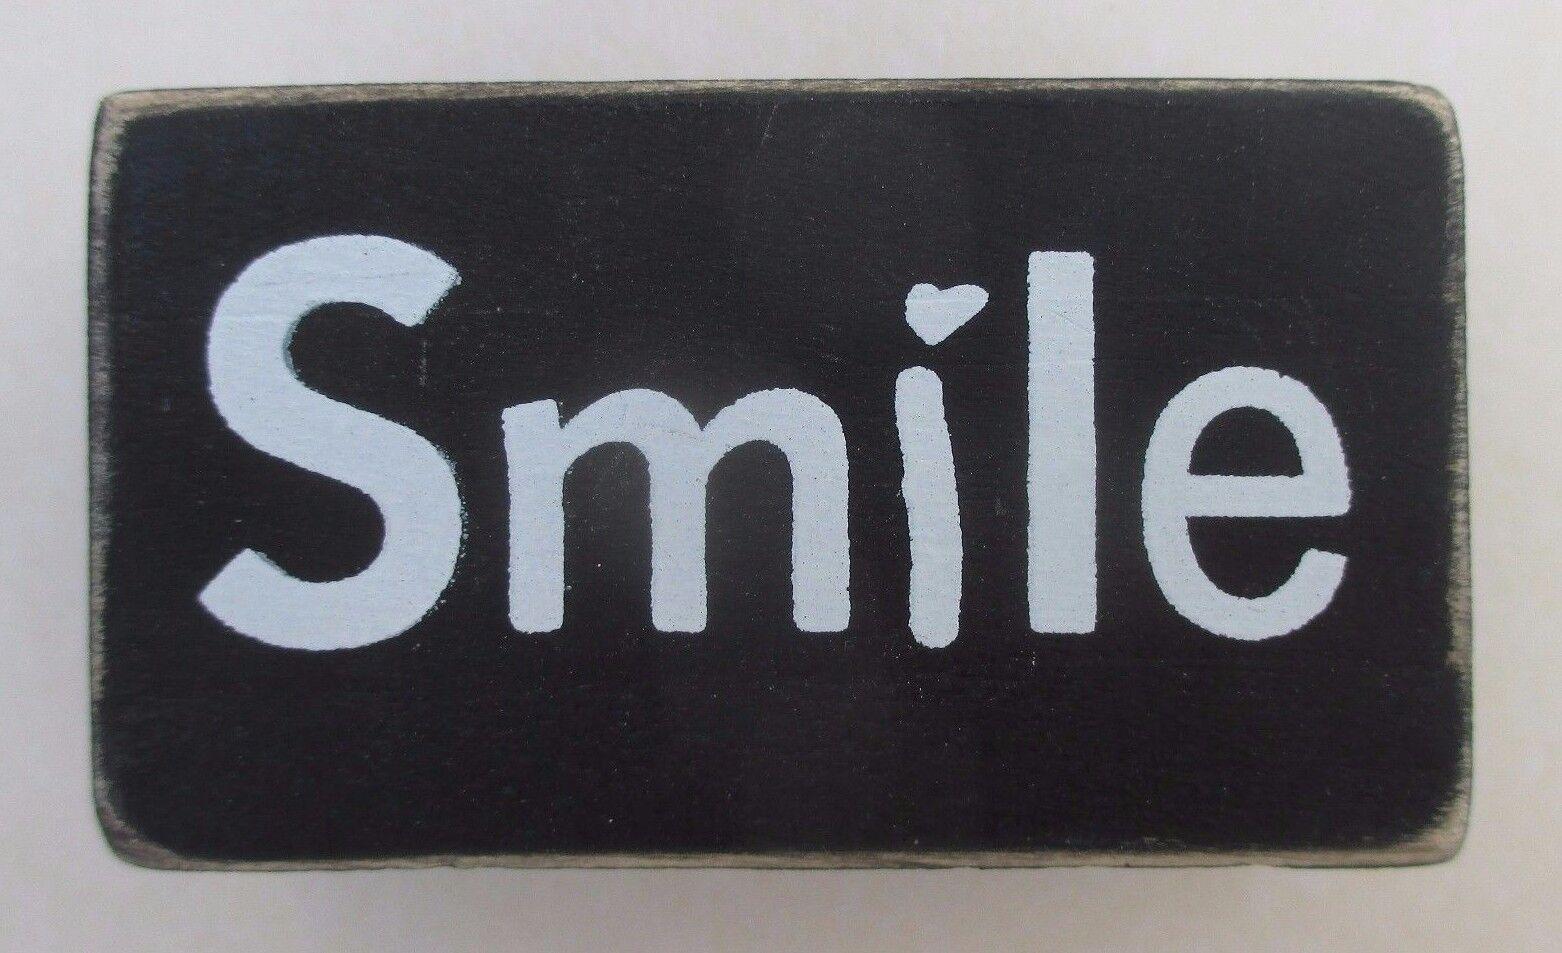 P Smile Word Blocks Wood Home Decor Distressed Block